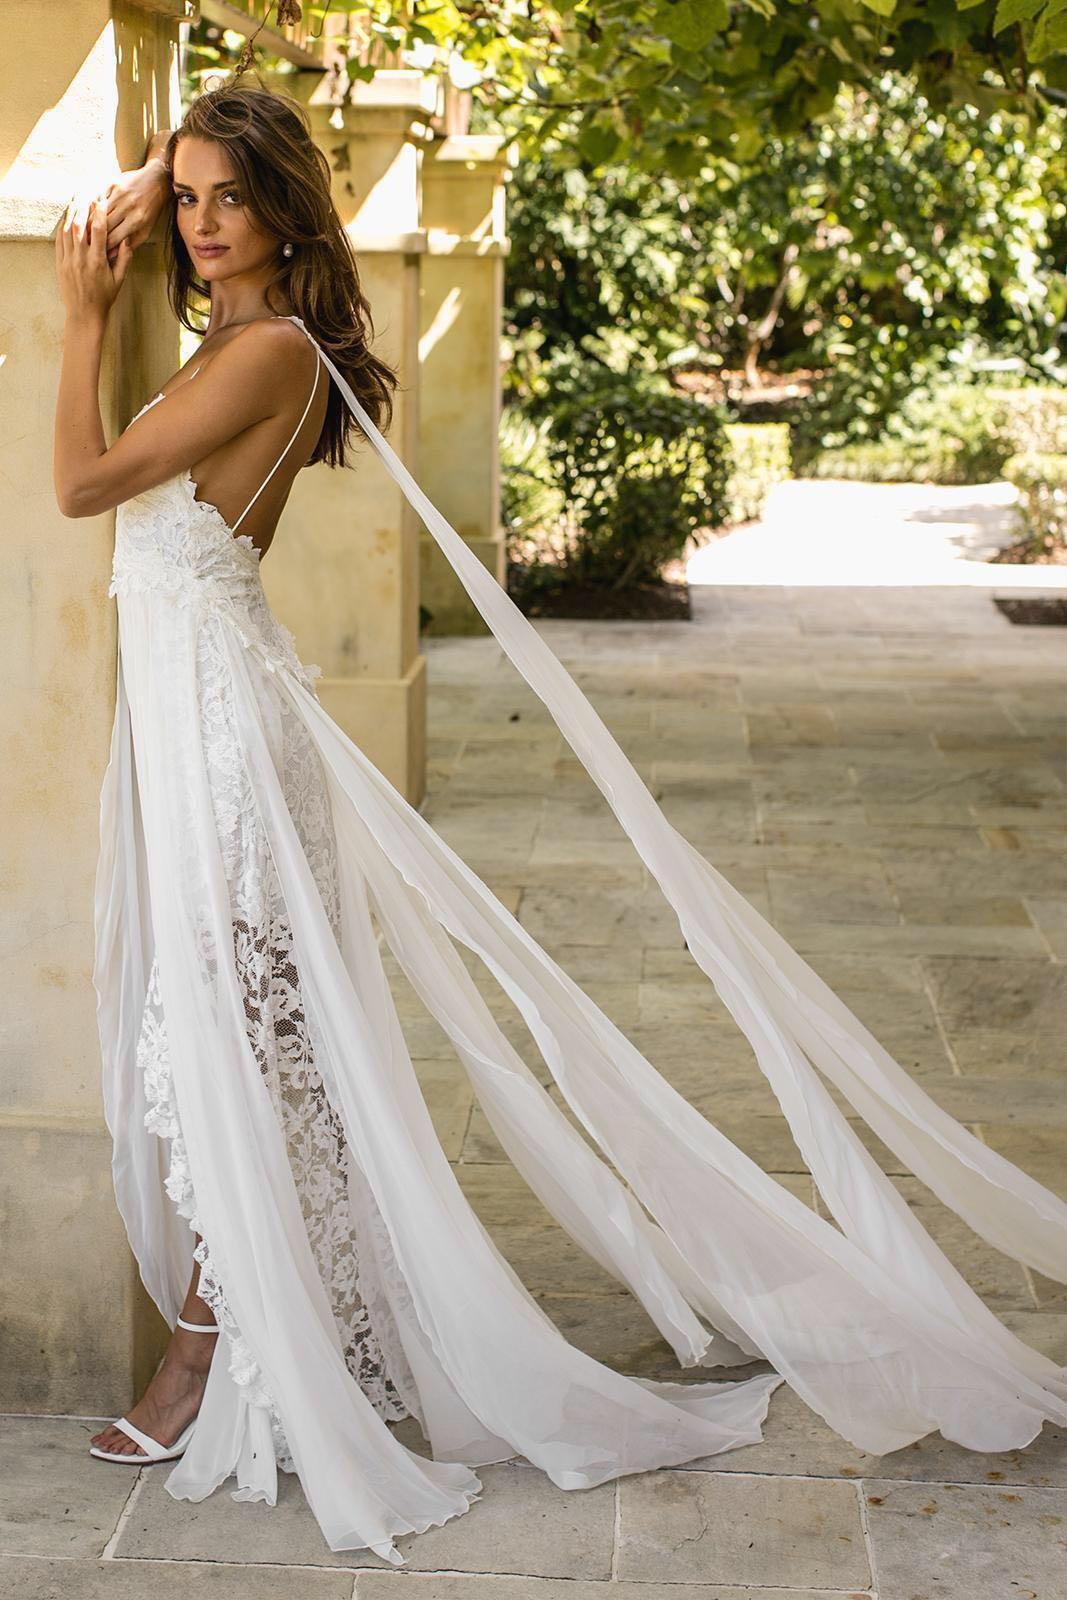 8a6a0b74b92 Wedding Gown: Grace Loves Lace Hollie 2.0 Dress, Women's Fashion ...